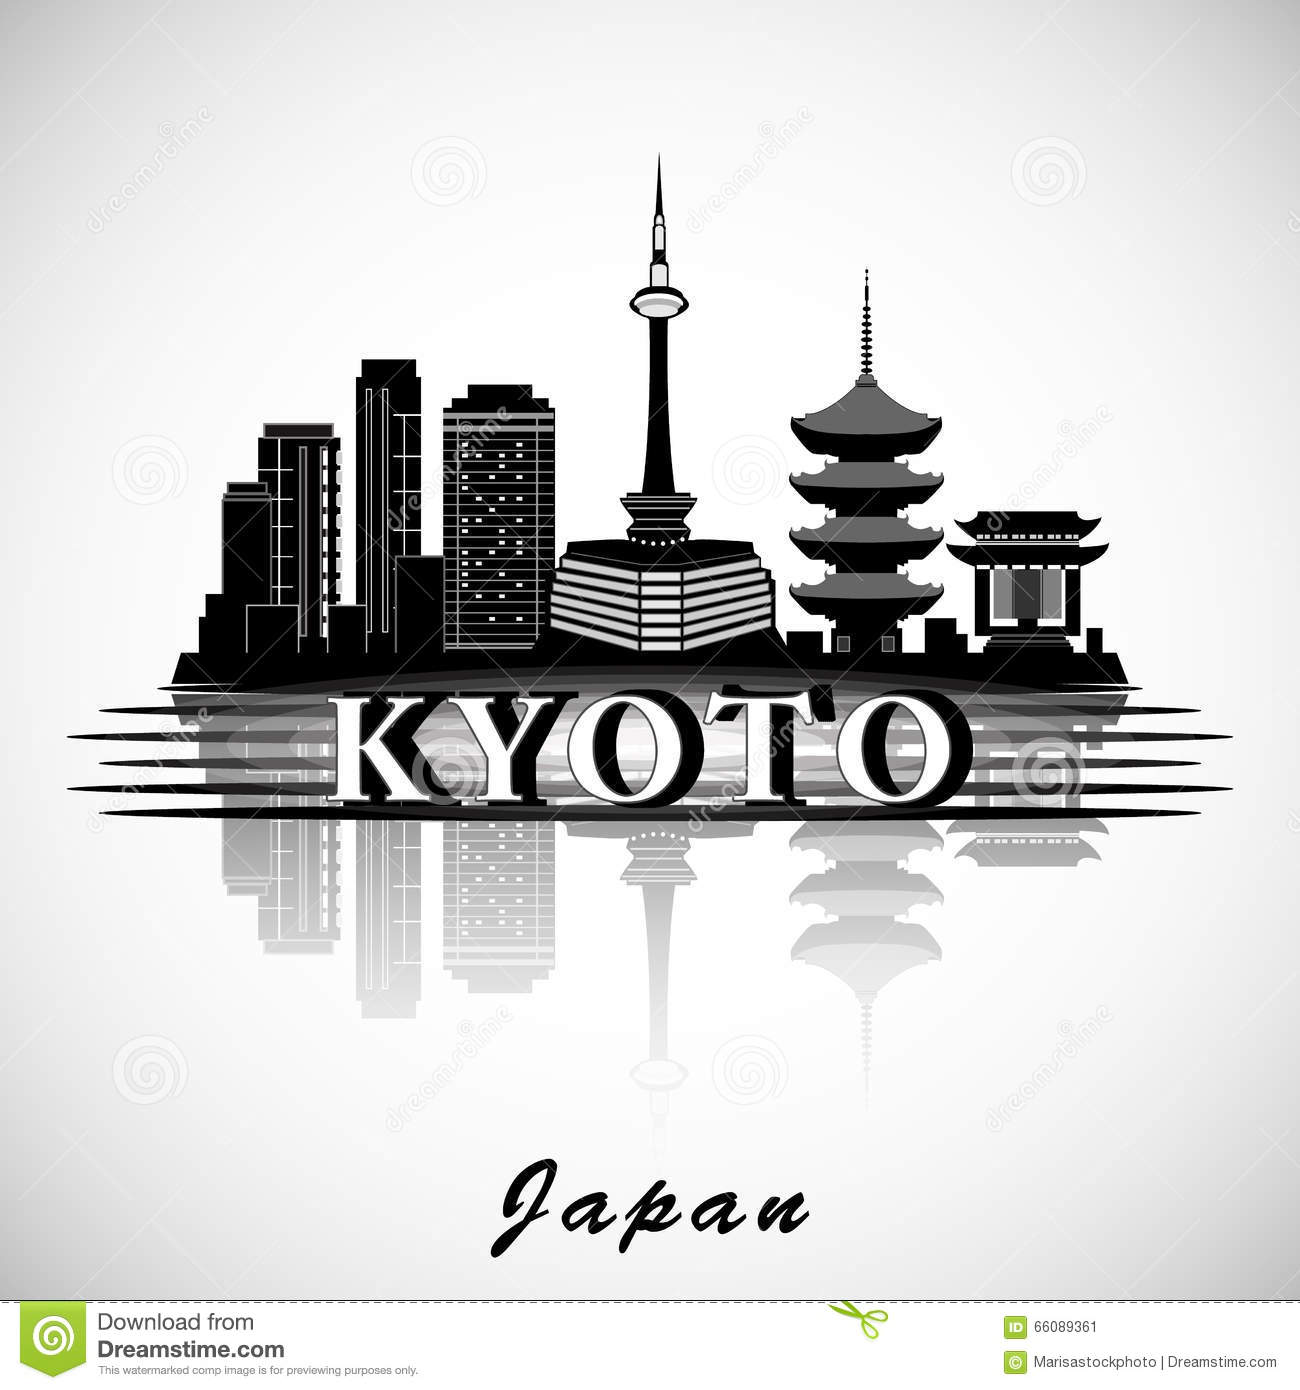 Kyoto clipart.